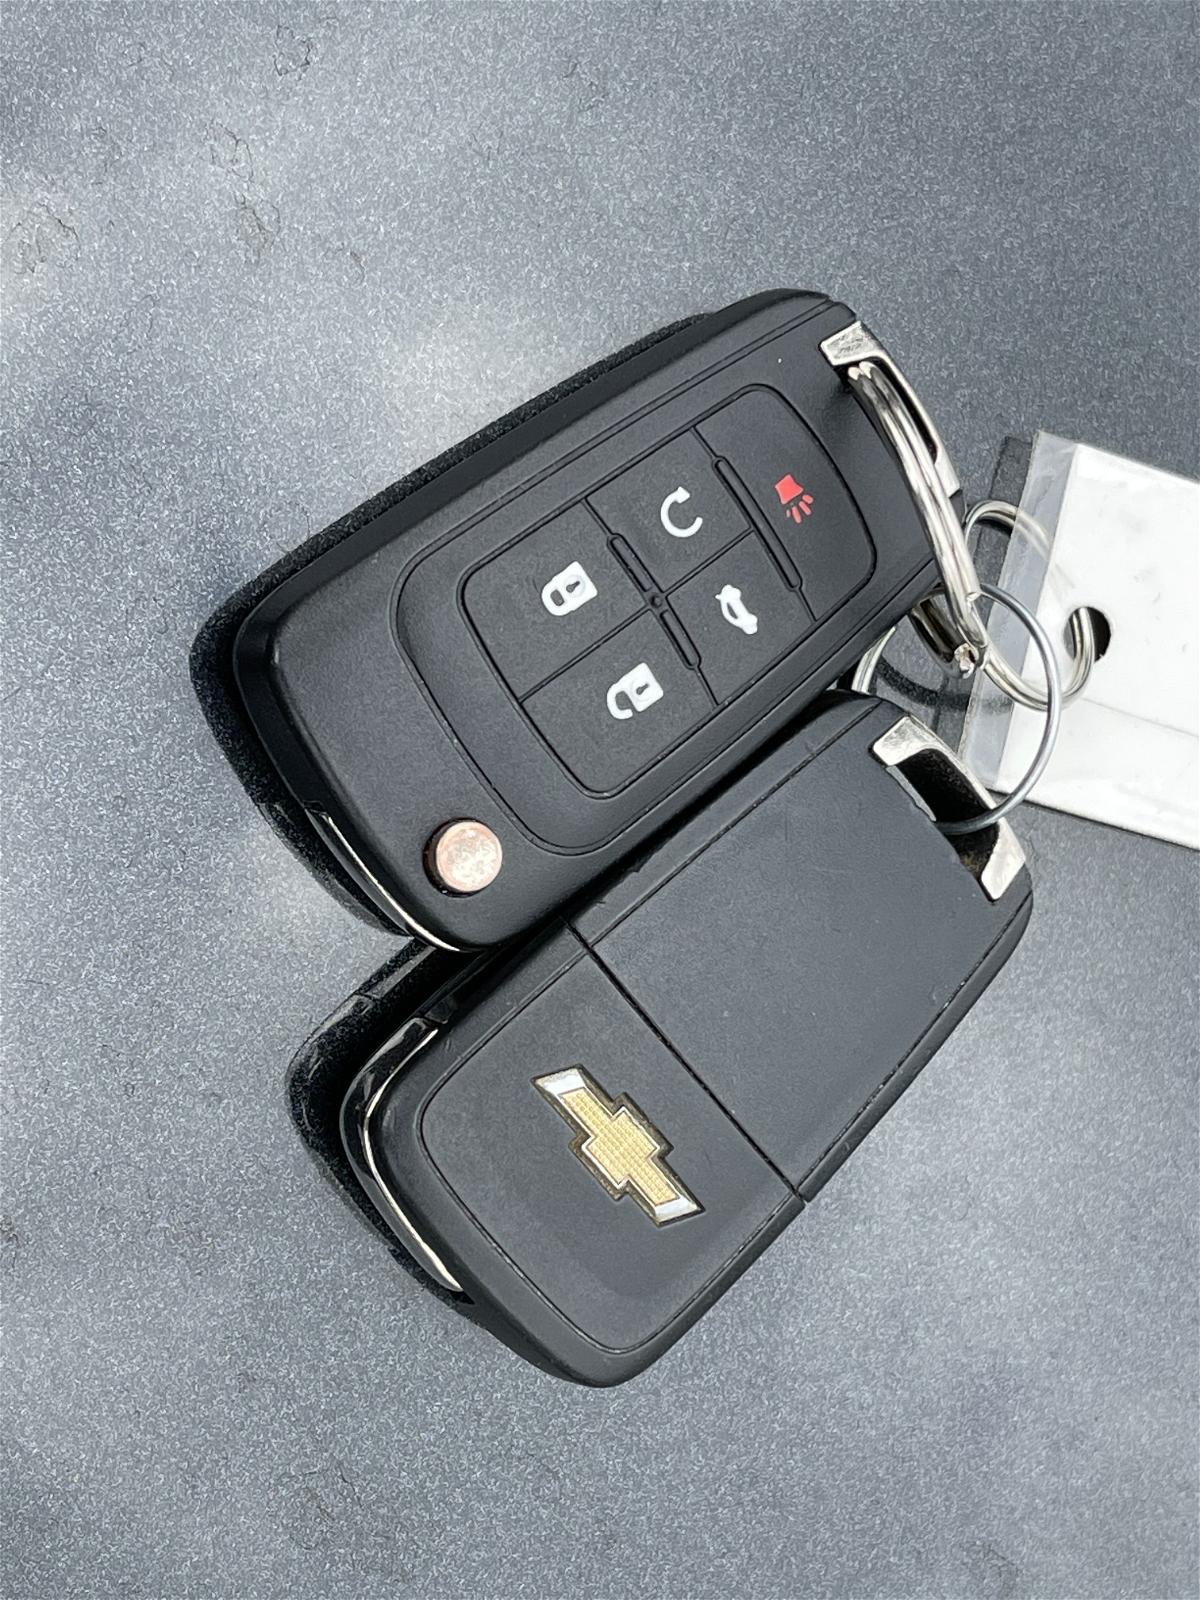 2013 - Chevrolet - Malibu - 1G11D5SR9DF160956